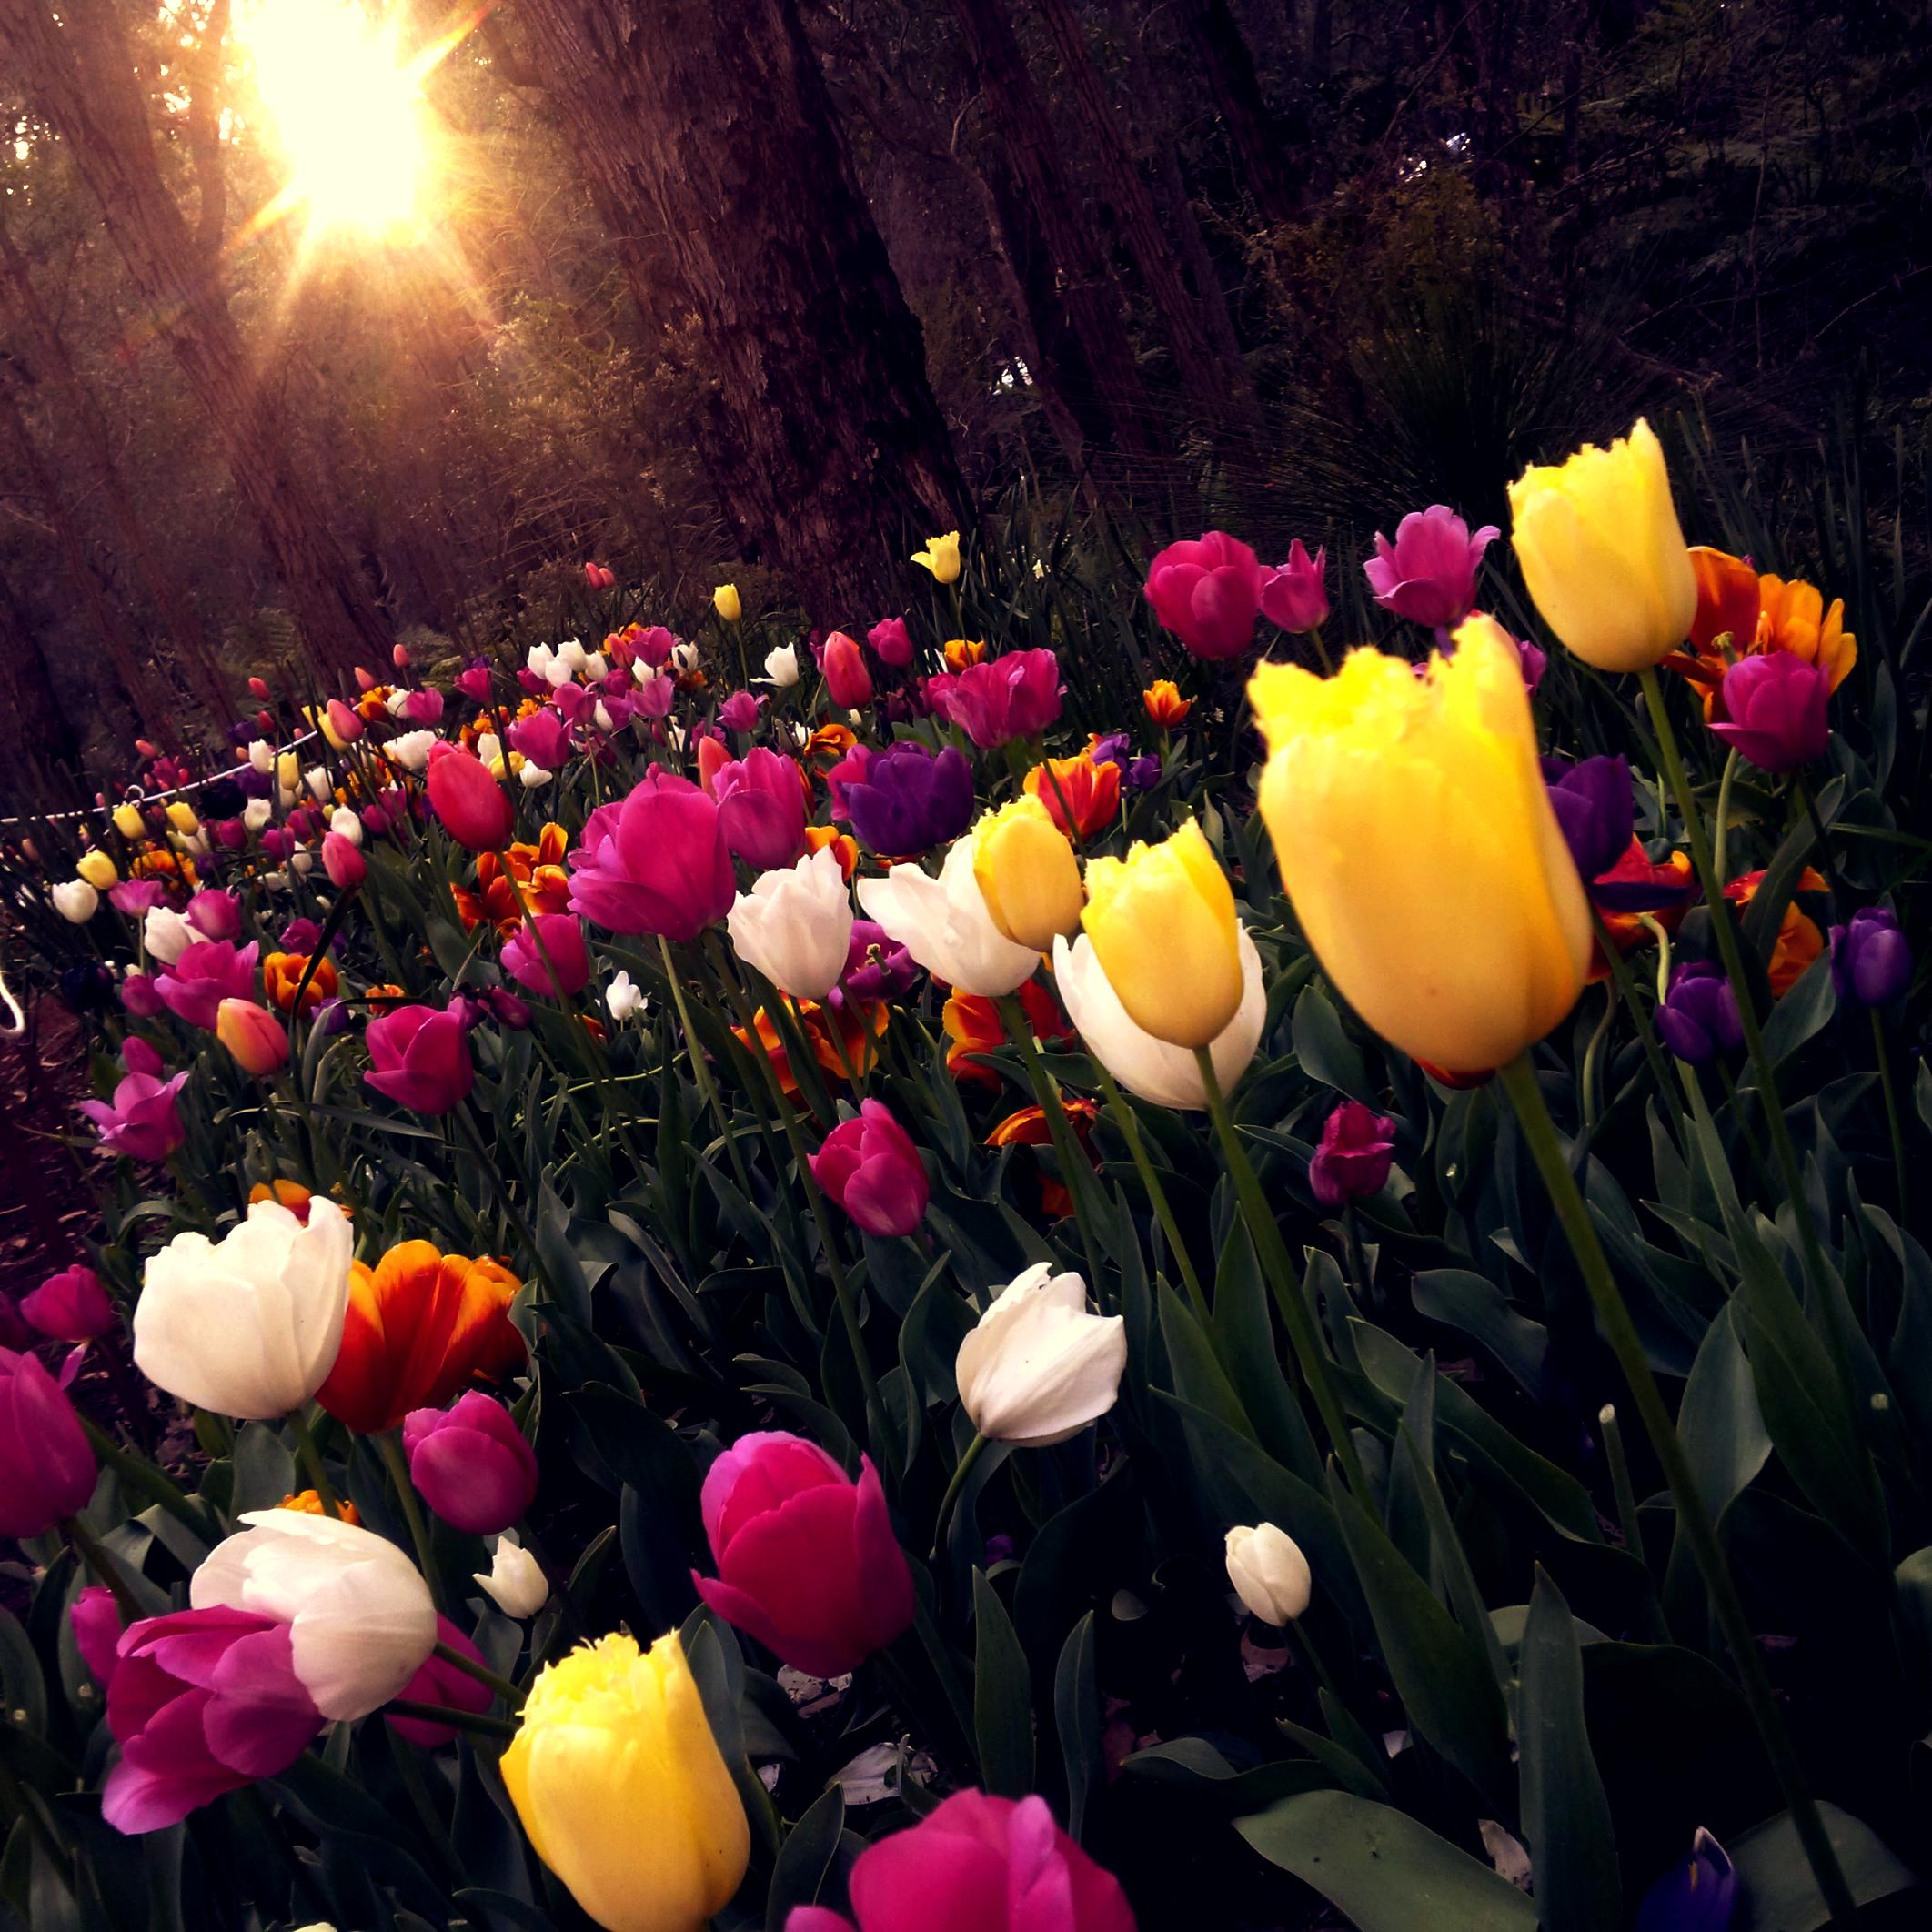 Beautiful Fall Wallpaper Desktop 1000 Amazing Flower Garden Photos 183 Pexels 183 Free Stock